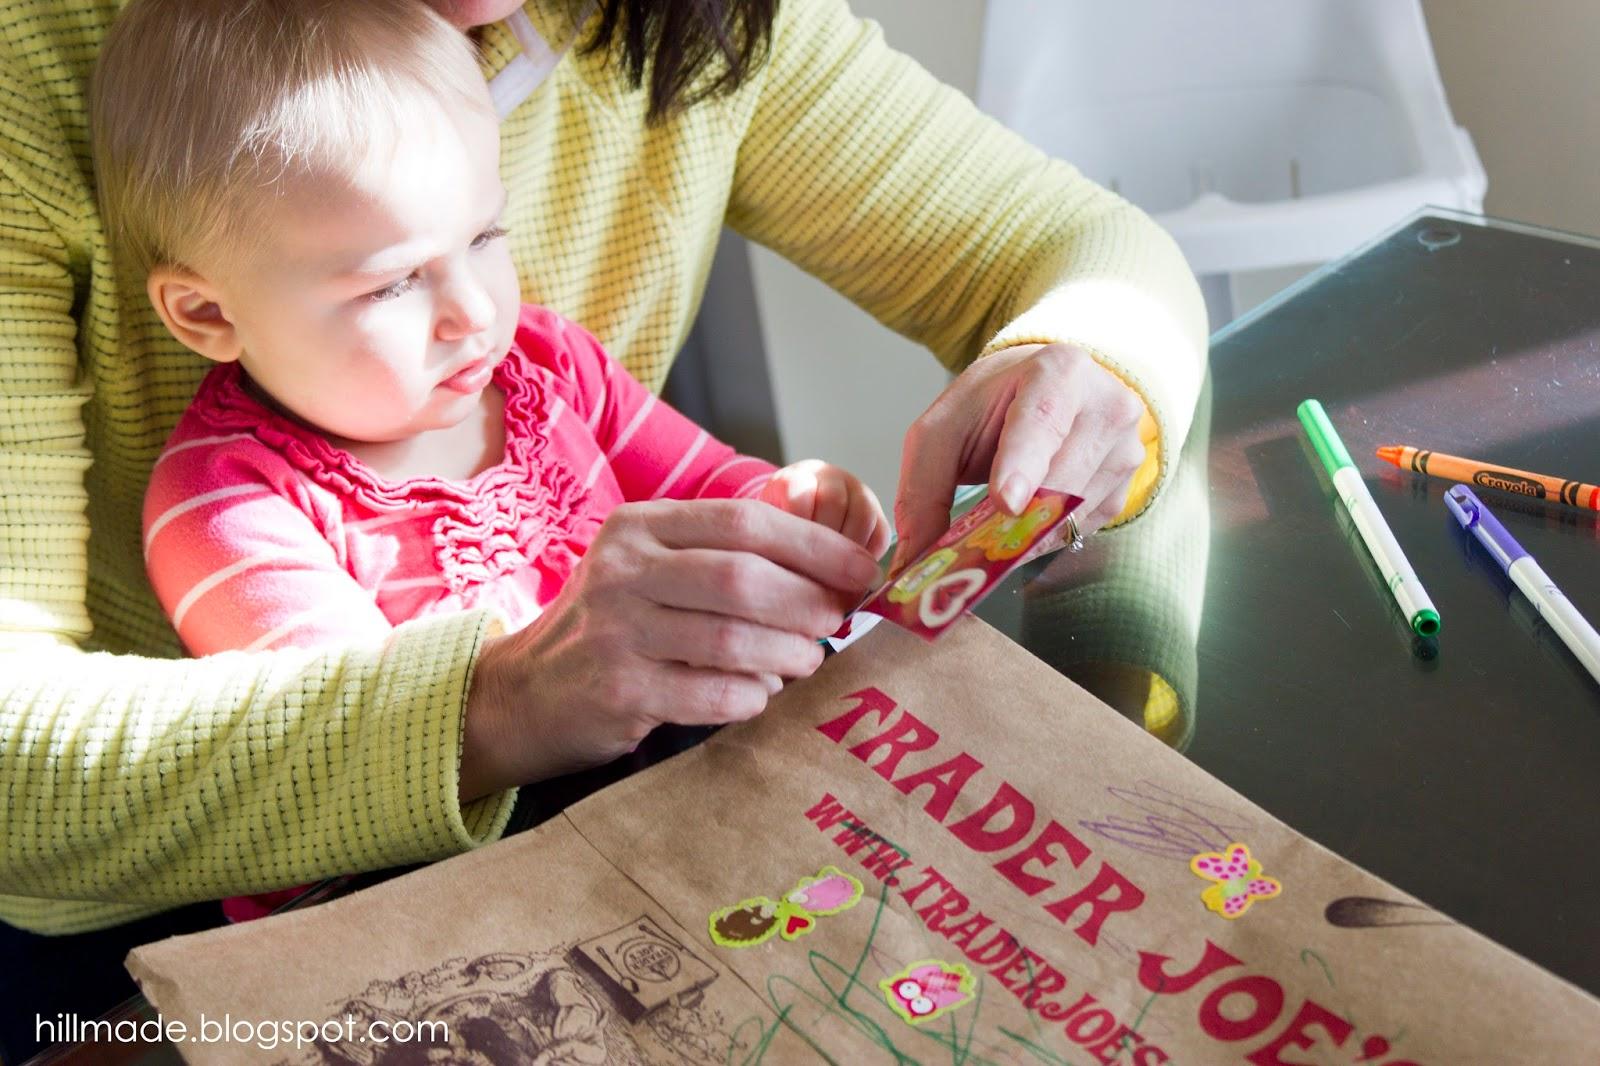 Make a paper bag dress to go along with the story The Paper Bag Princess by Robert Munsch | hillmade.blogspot.com